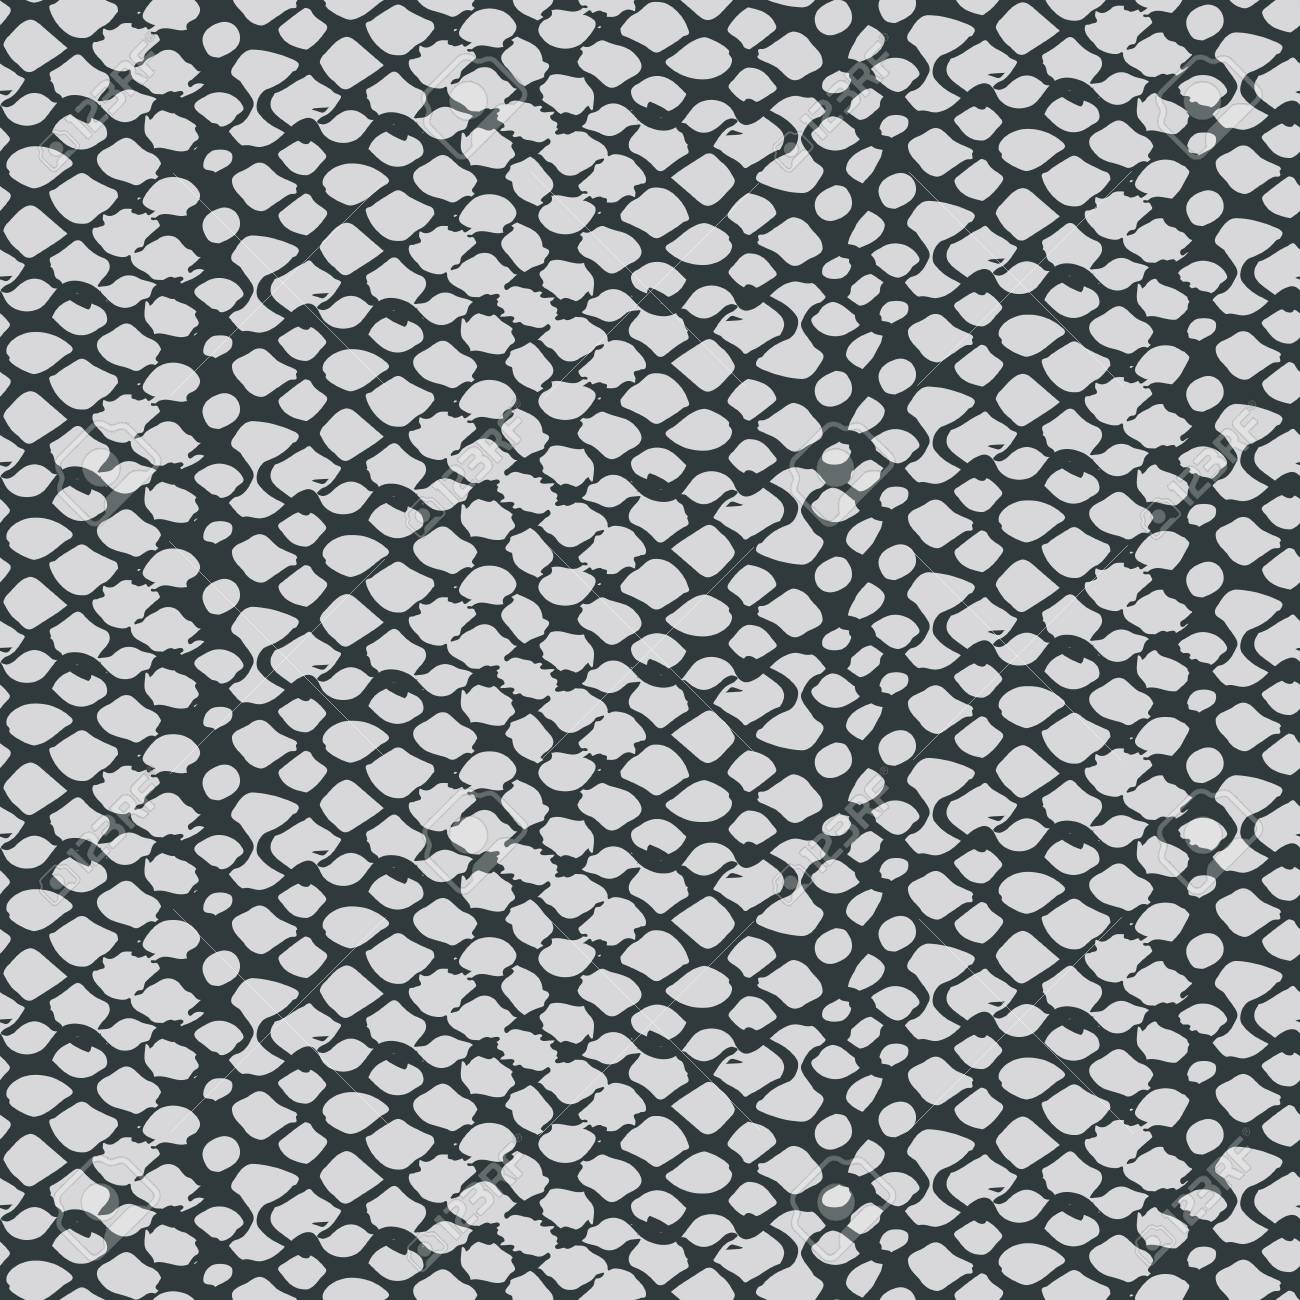 Monochrome snake skin texture seamless pattern - 104240486